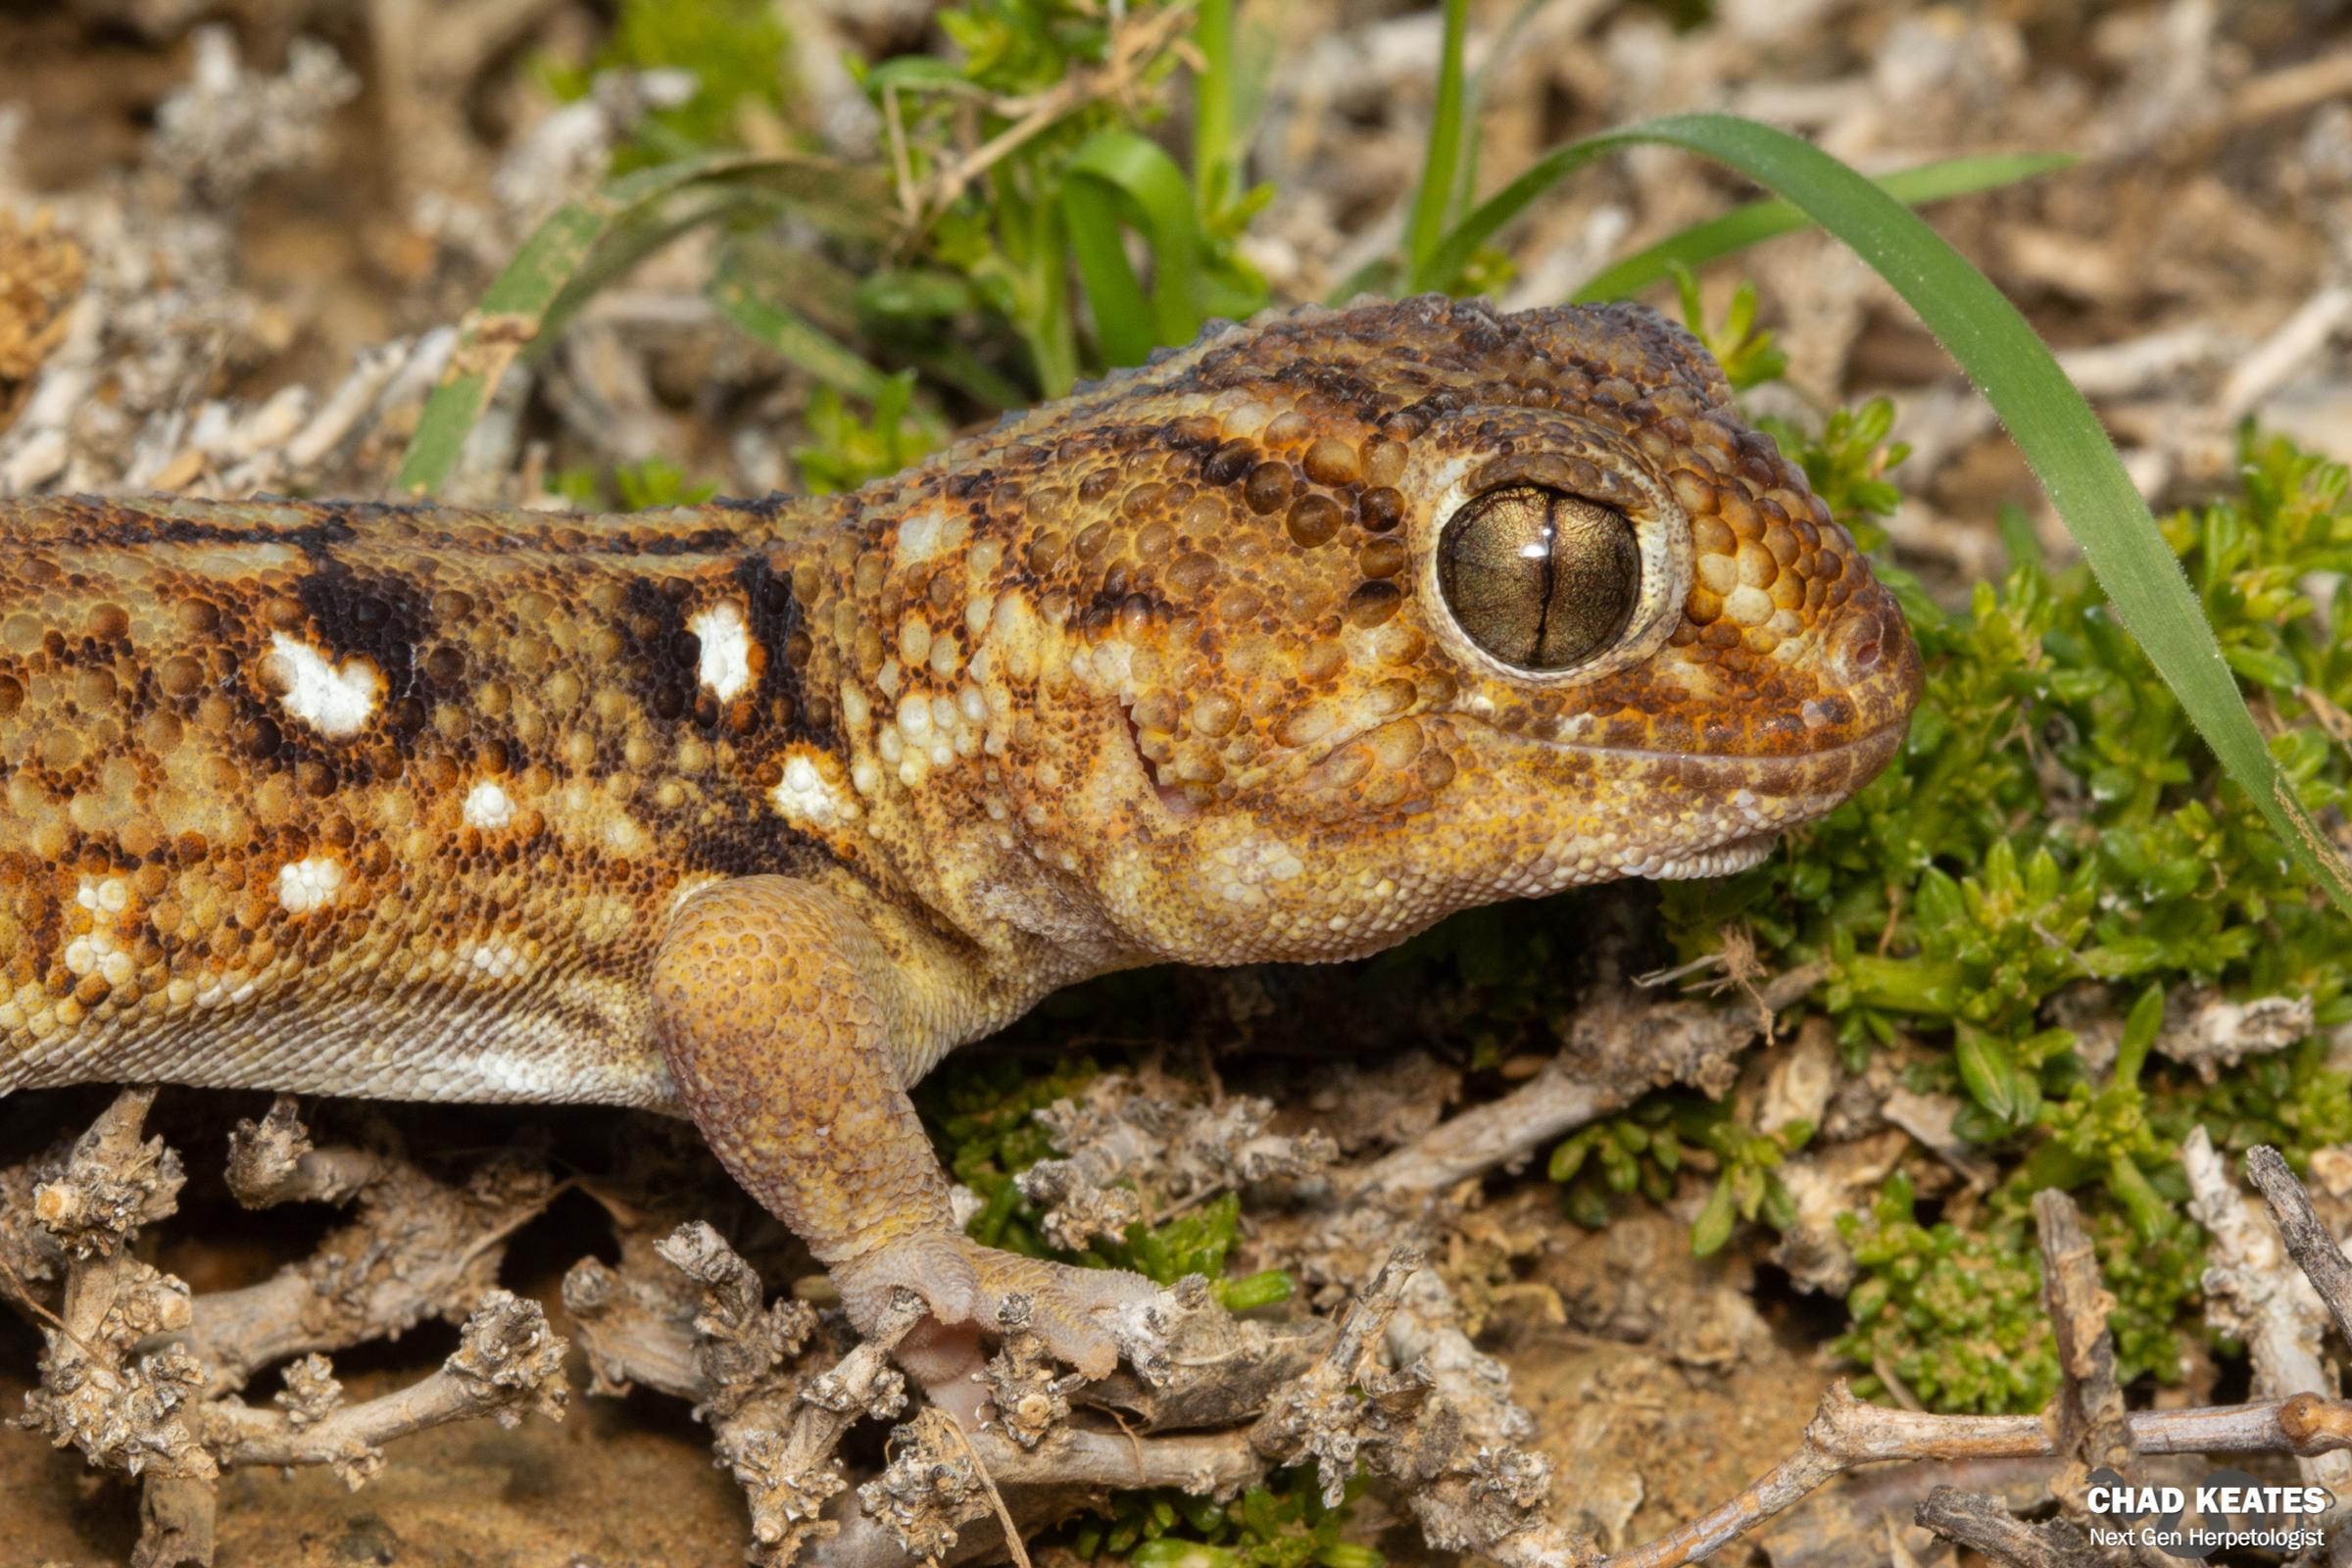 Chondrodactylus_angulifer_Giant_Ground_Gecko_Bitterfontein_Chad_Keates_2019